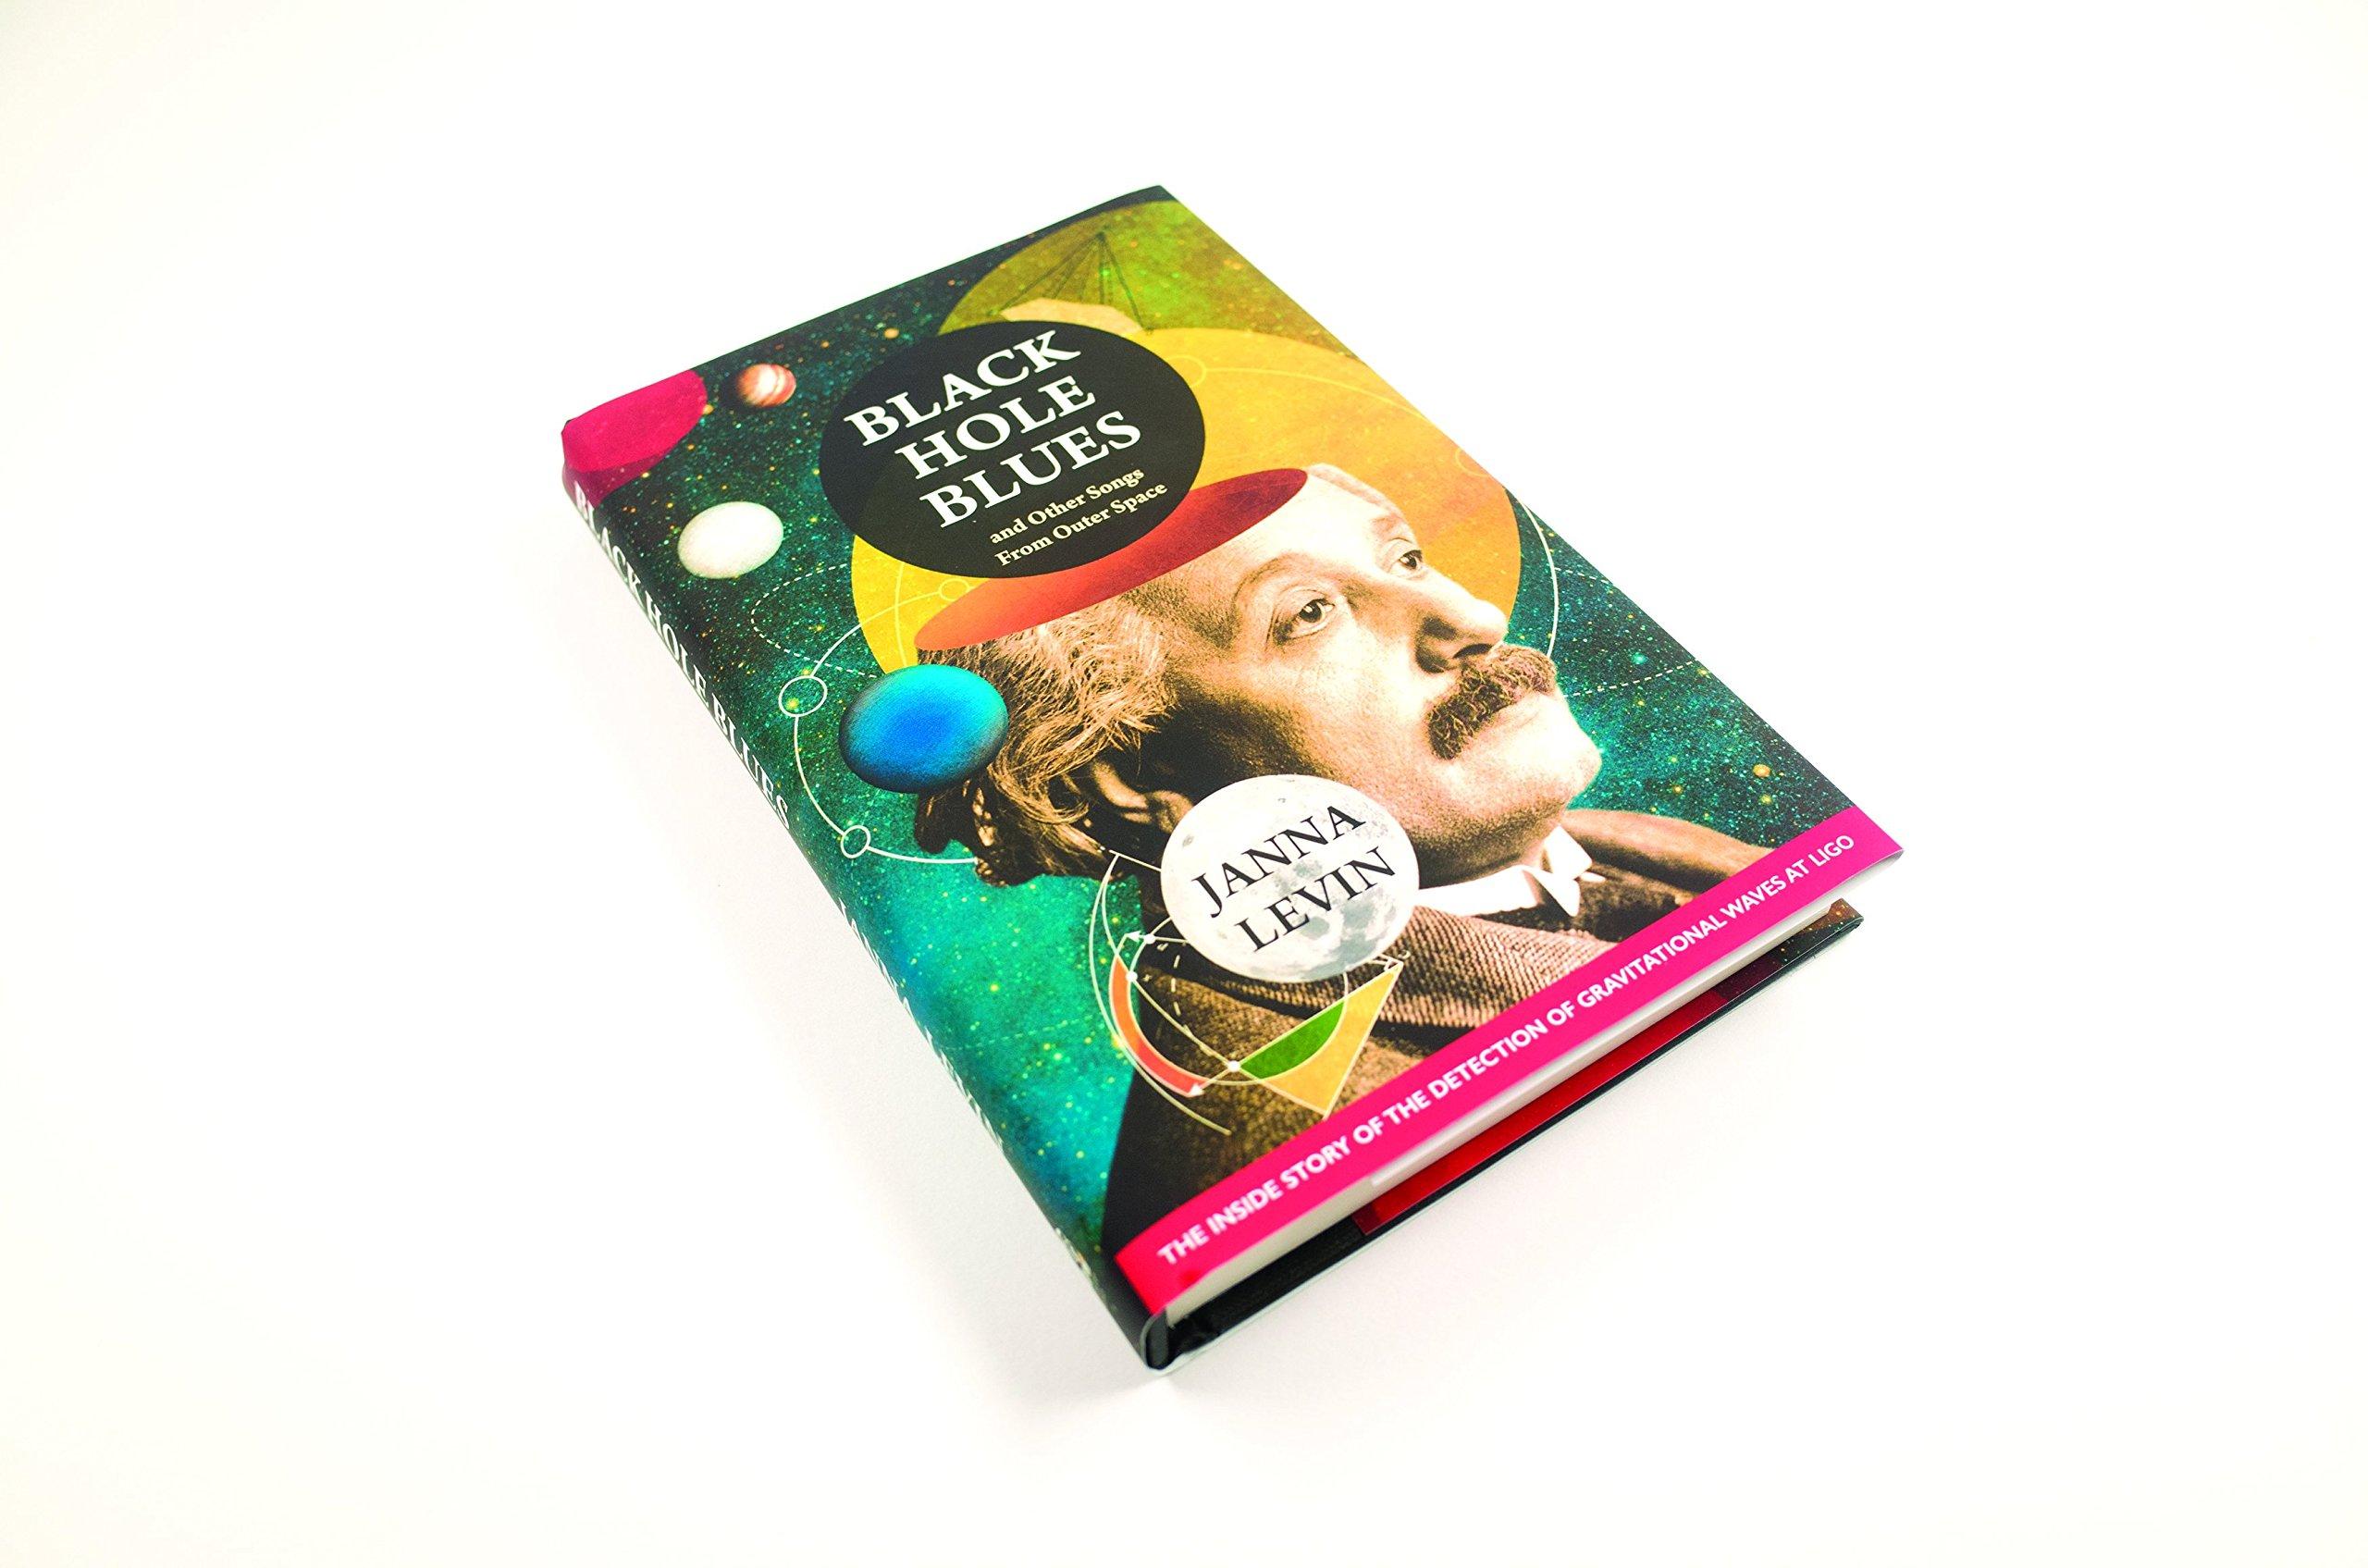 Black Hole Blues And Other Songs: Amazon.es: Janna Levin: Libros en idiomas extranjeros